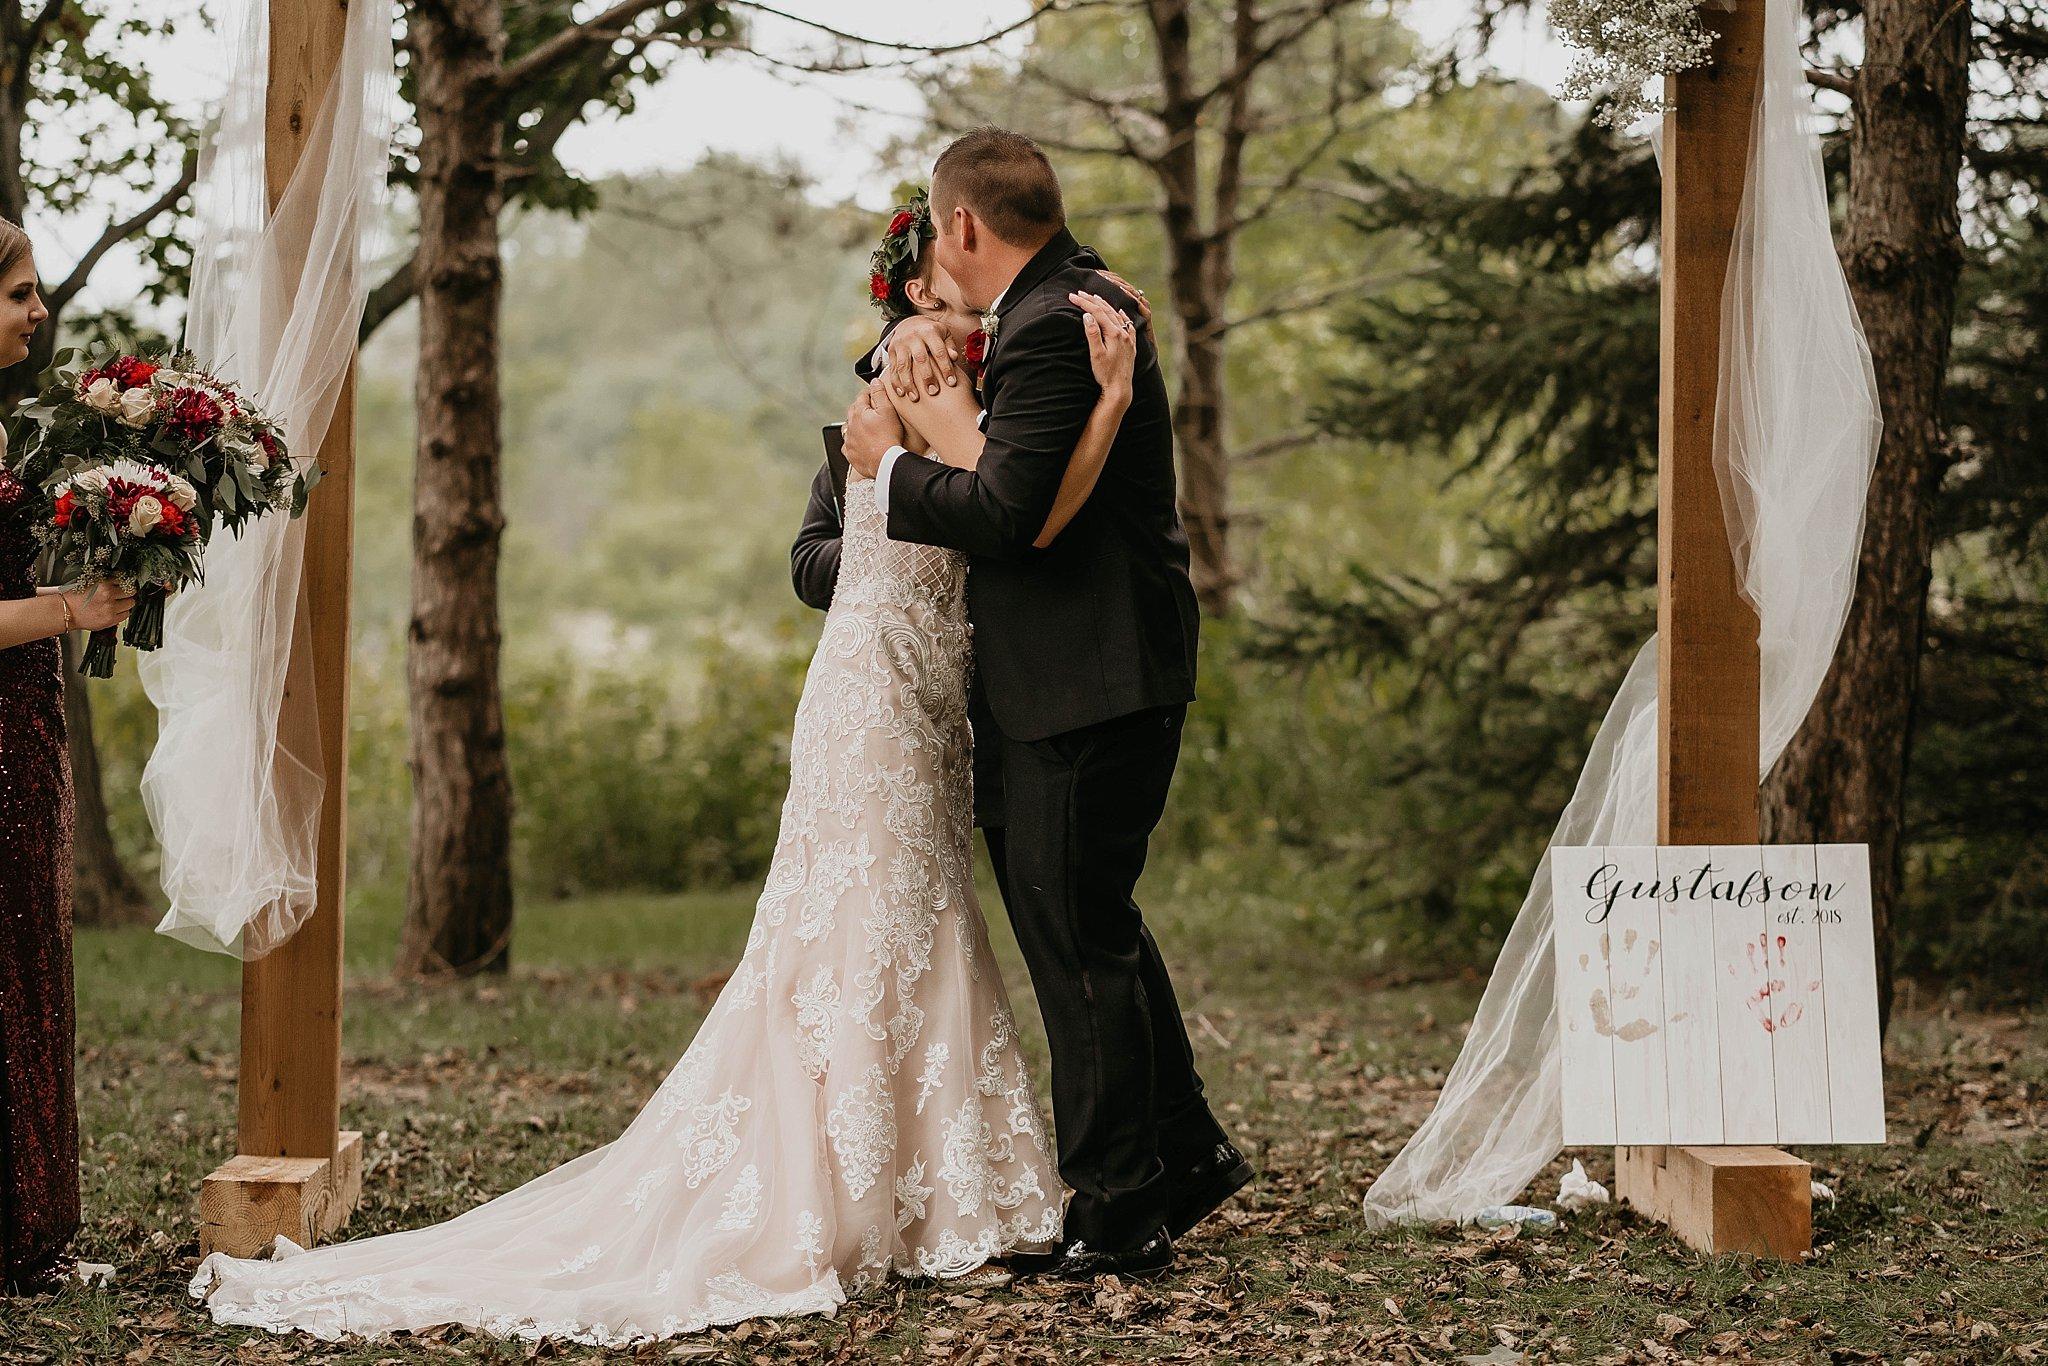 DesMoines-Iowa-Wedding-Photography-Destination-Photographer_0129.jpg